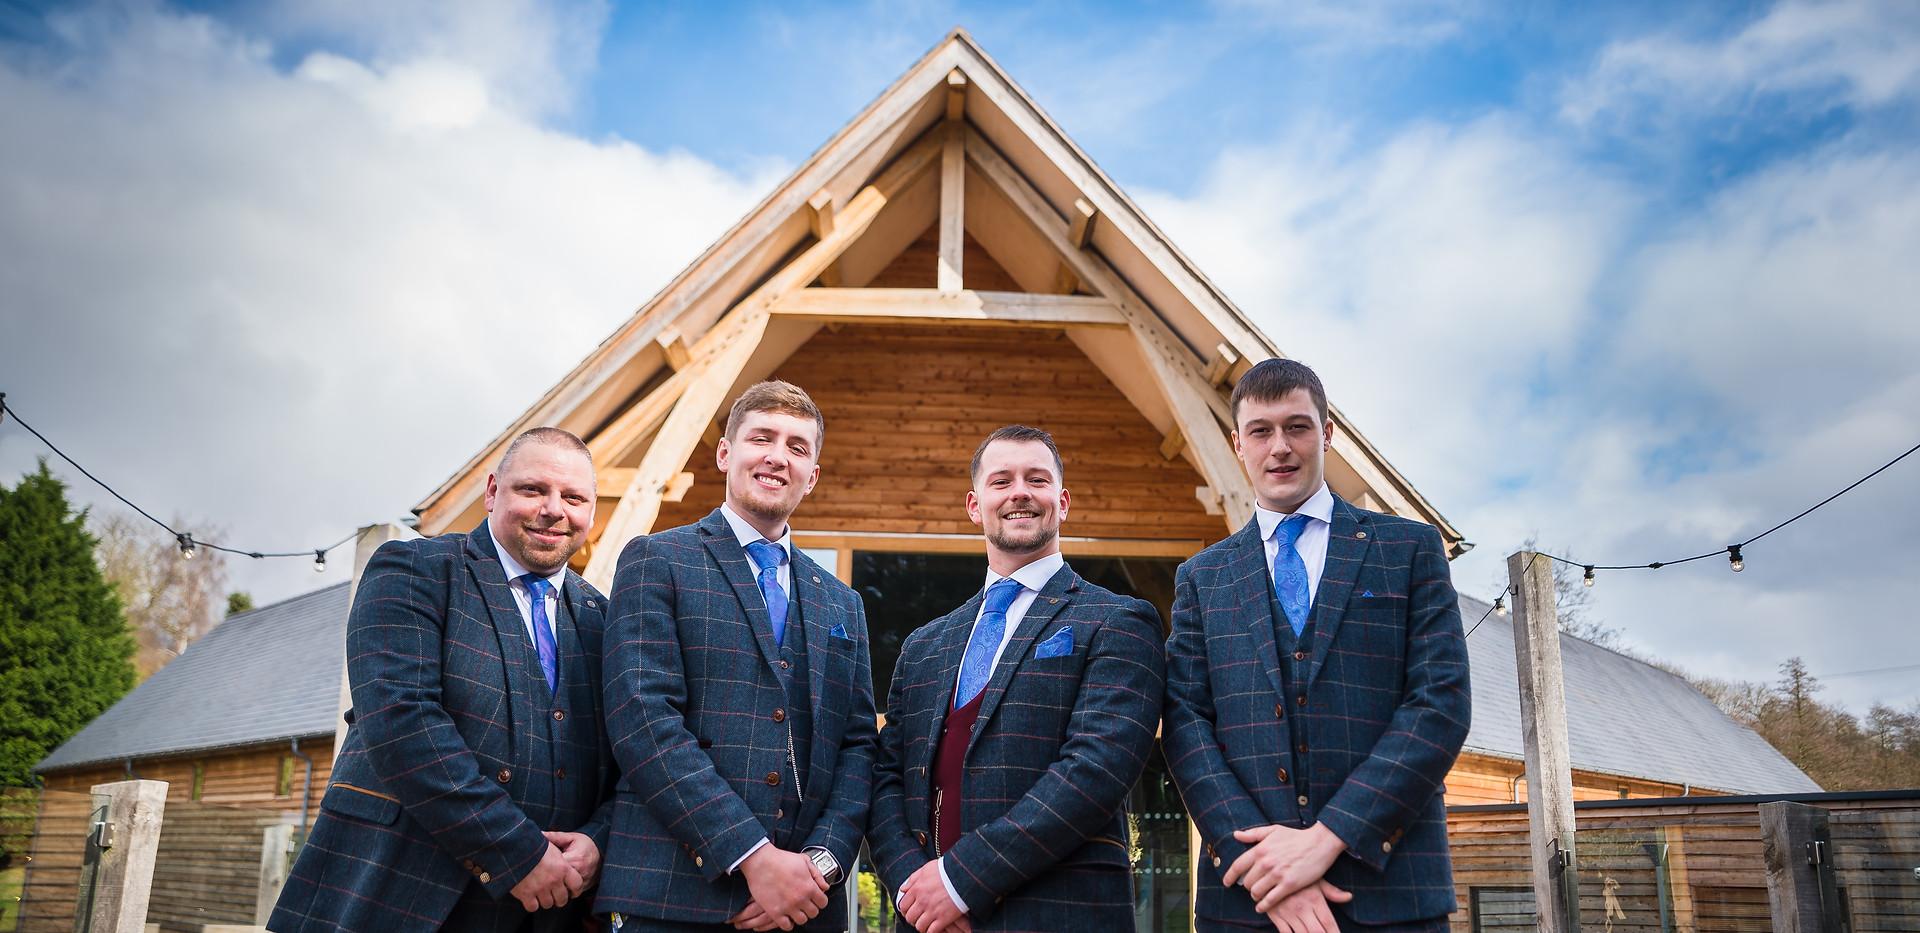 The Mill Barns Alveley Wedding Venue Shropshire